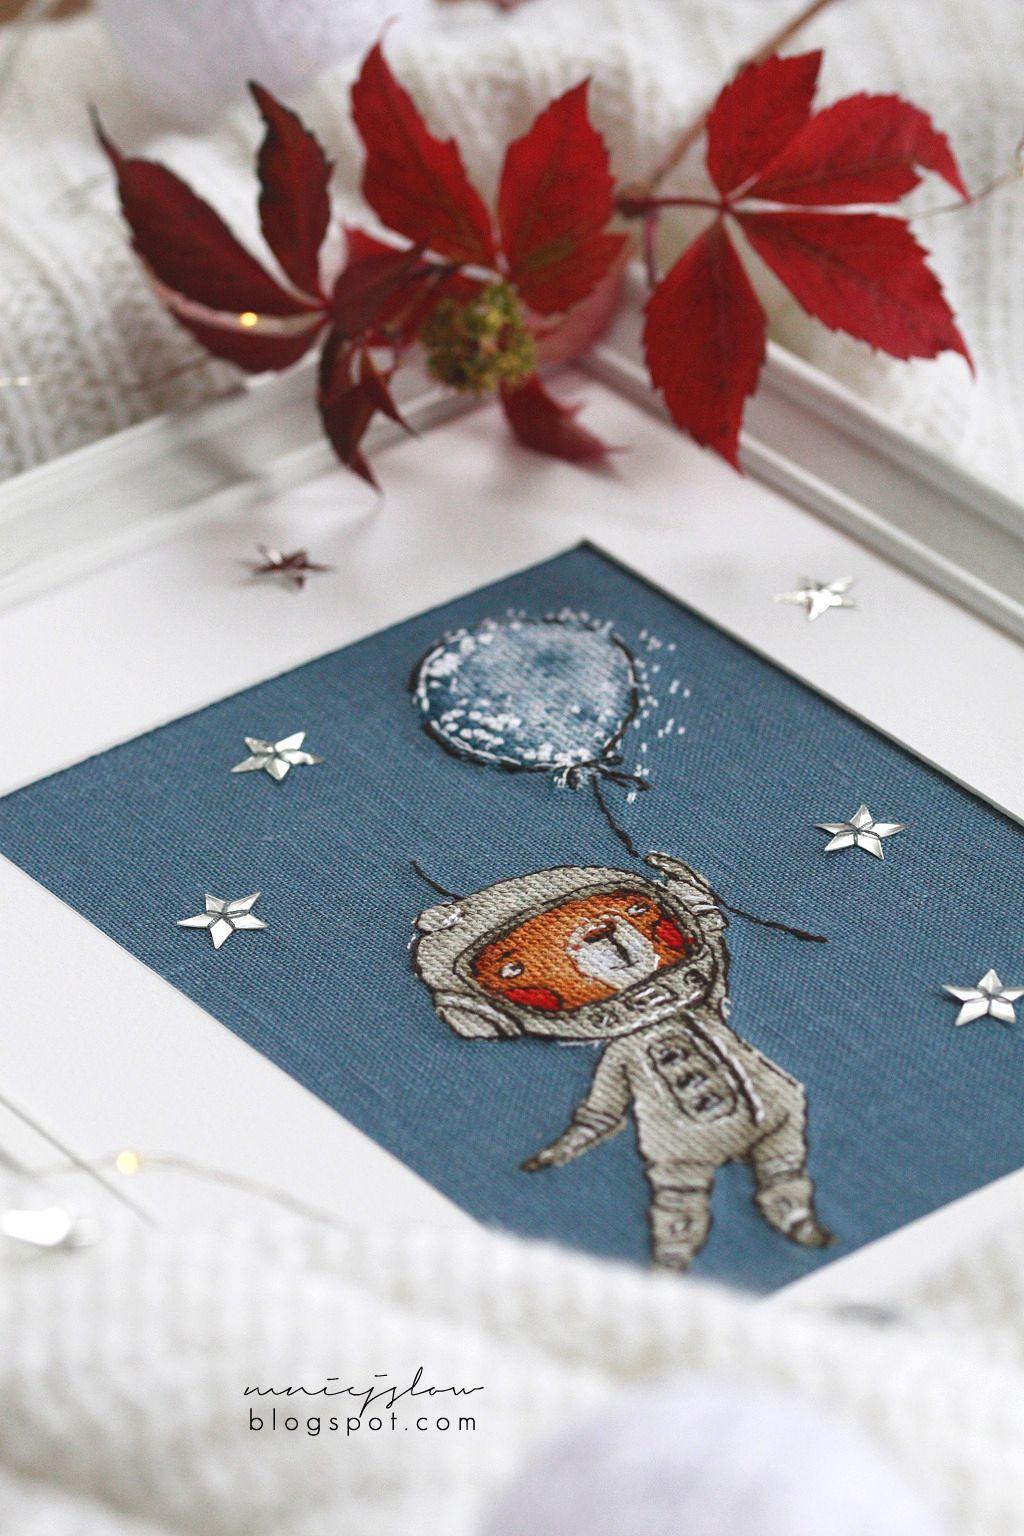 Ted cosmonaut -  sv_stitch ... with love (@svetlaja_maj)